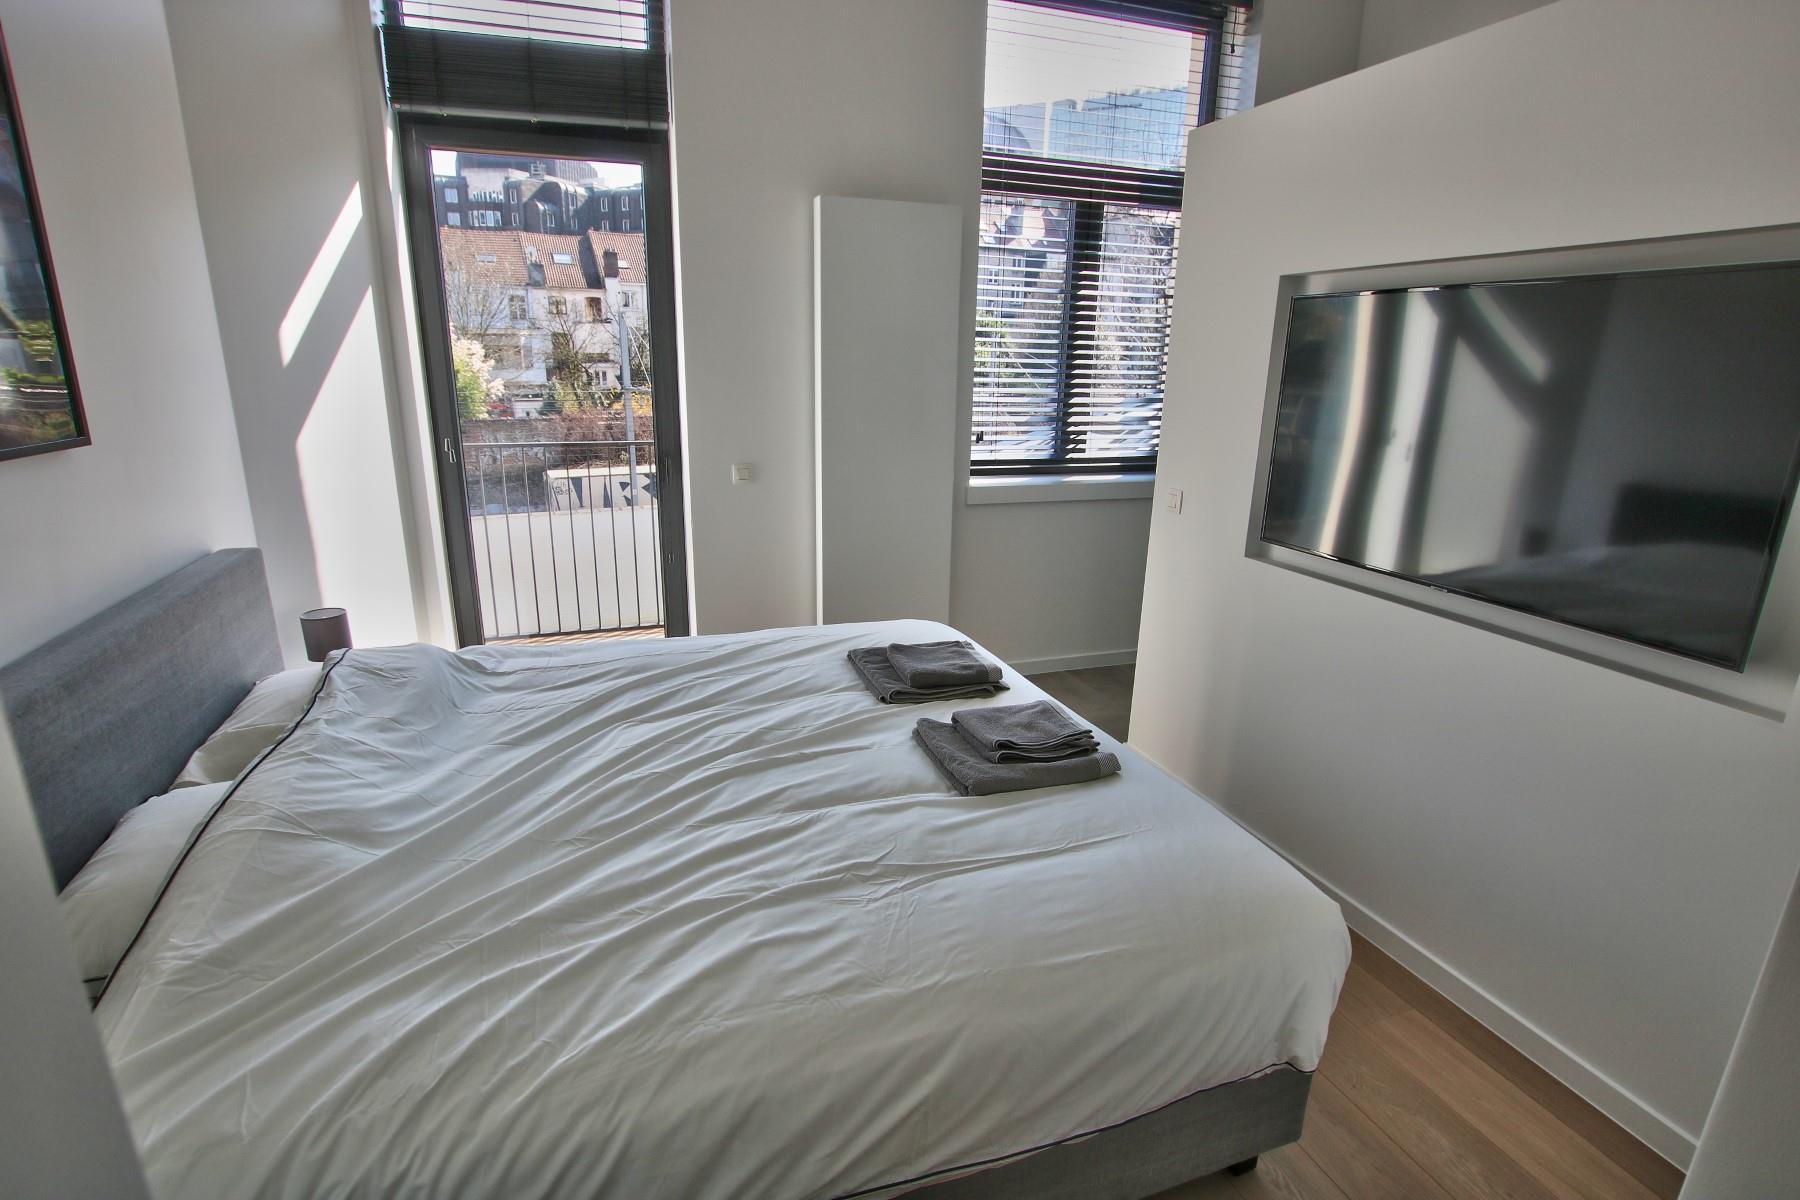 Appartement exceptionnel - Etterbeek - #4255737-5